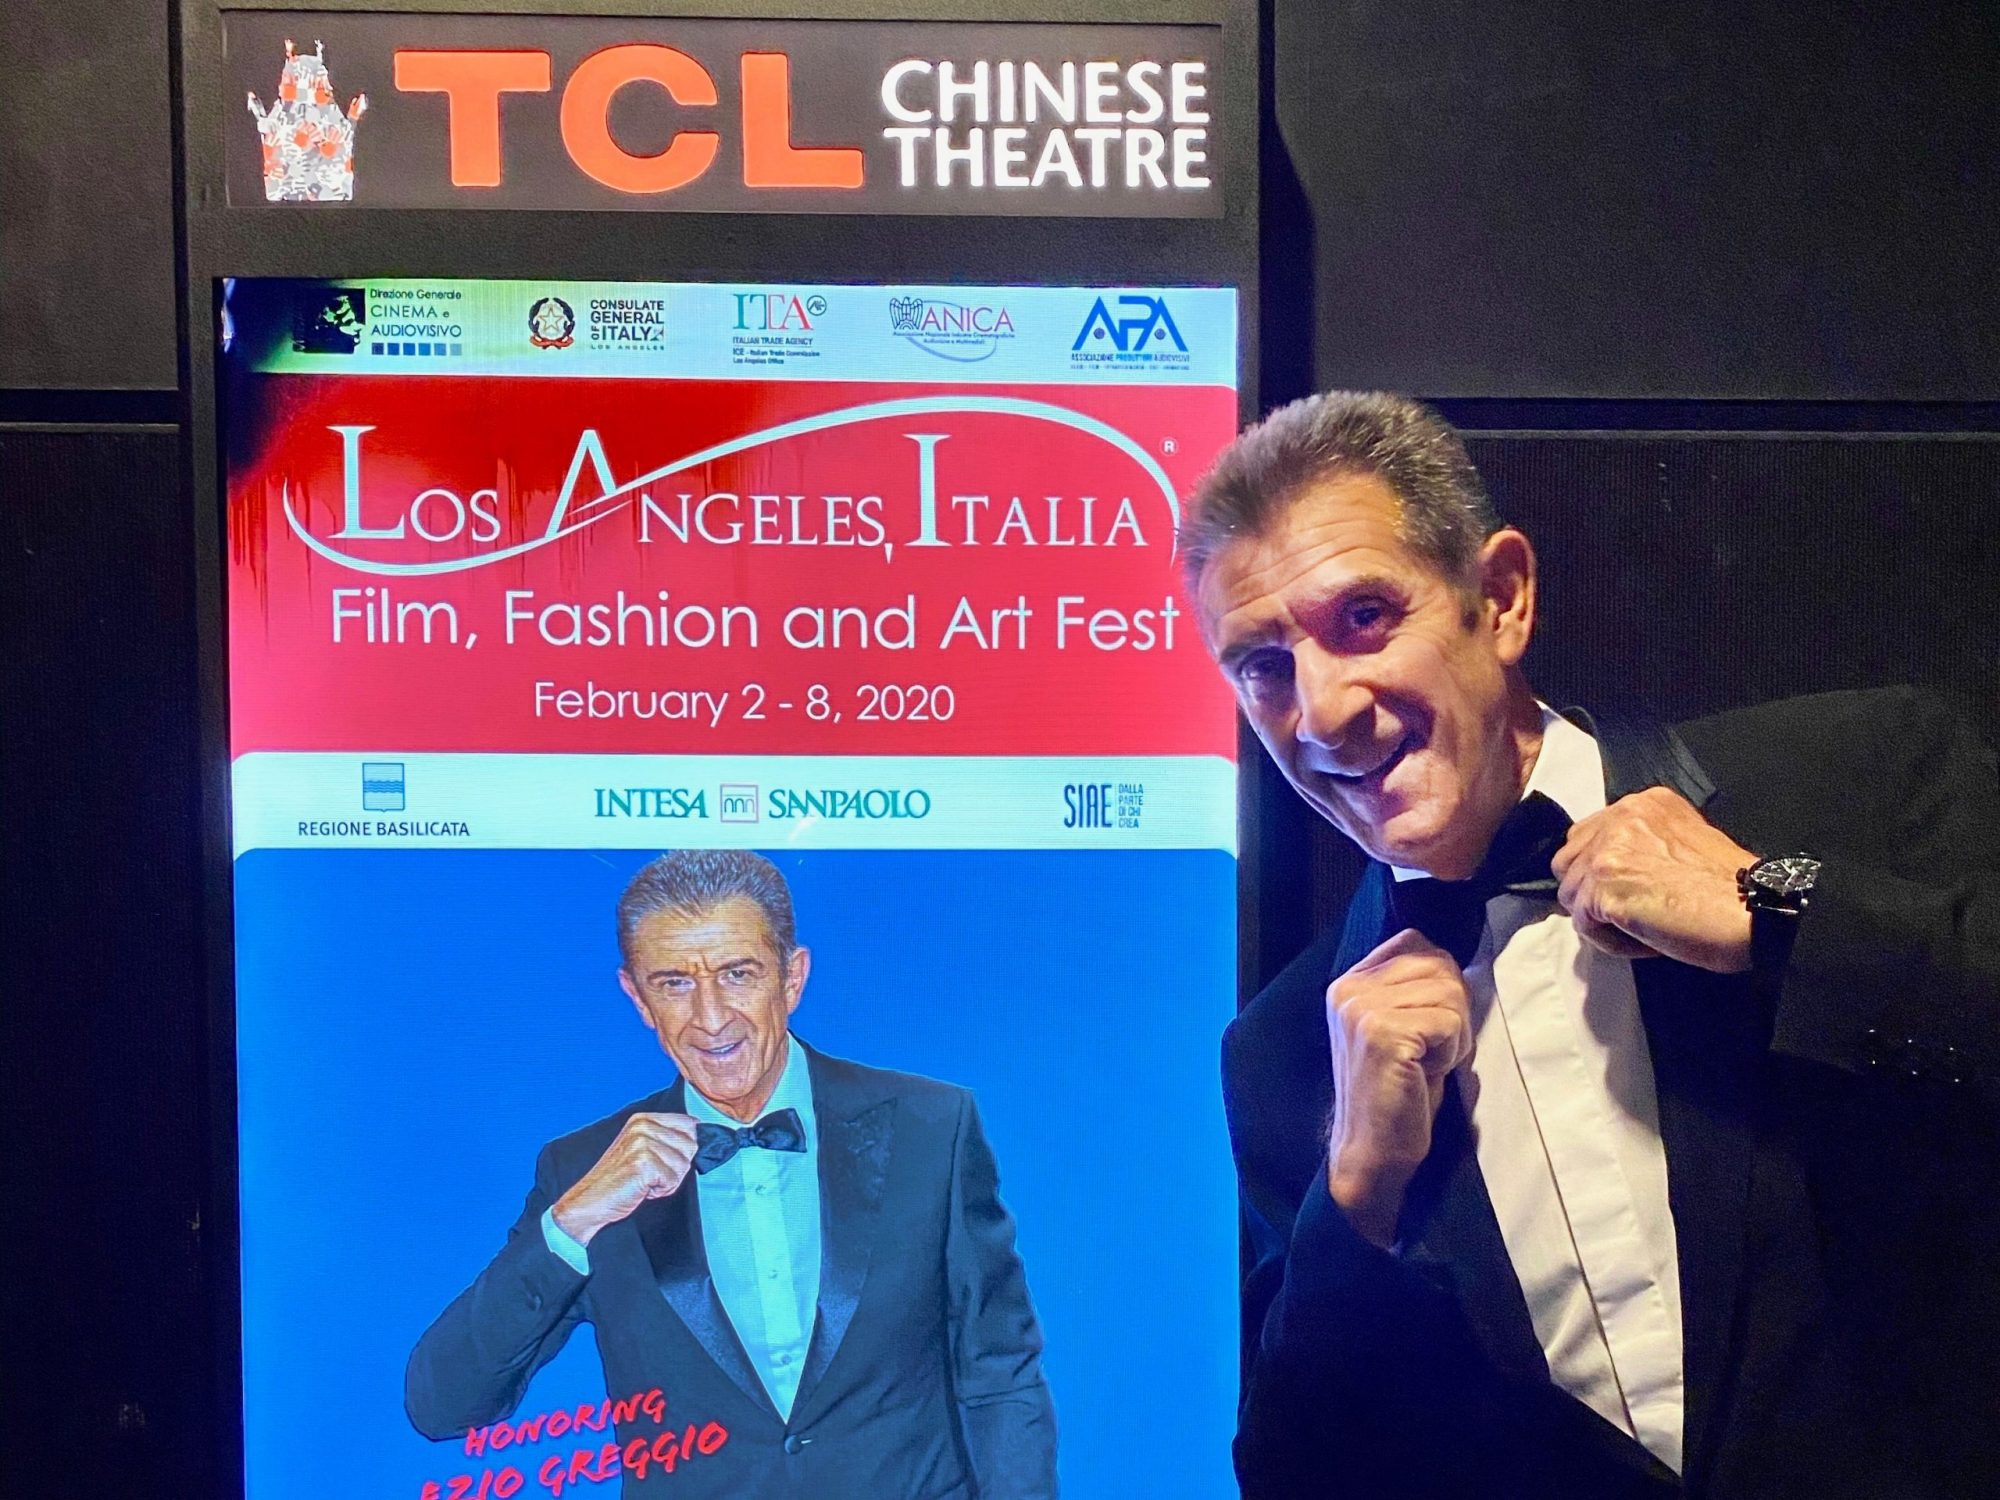 EXCELLENCE AWARD AL LOS ANGELES FILM FESTIVAL